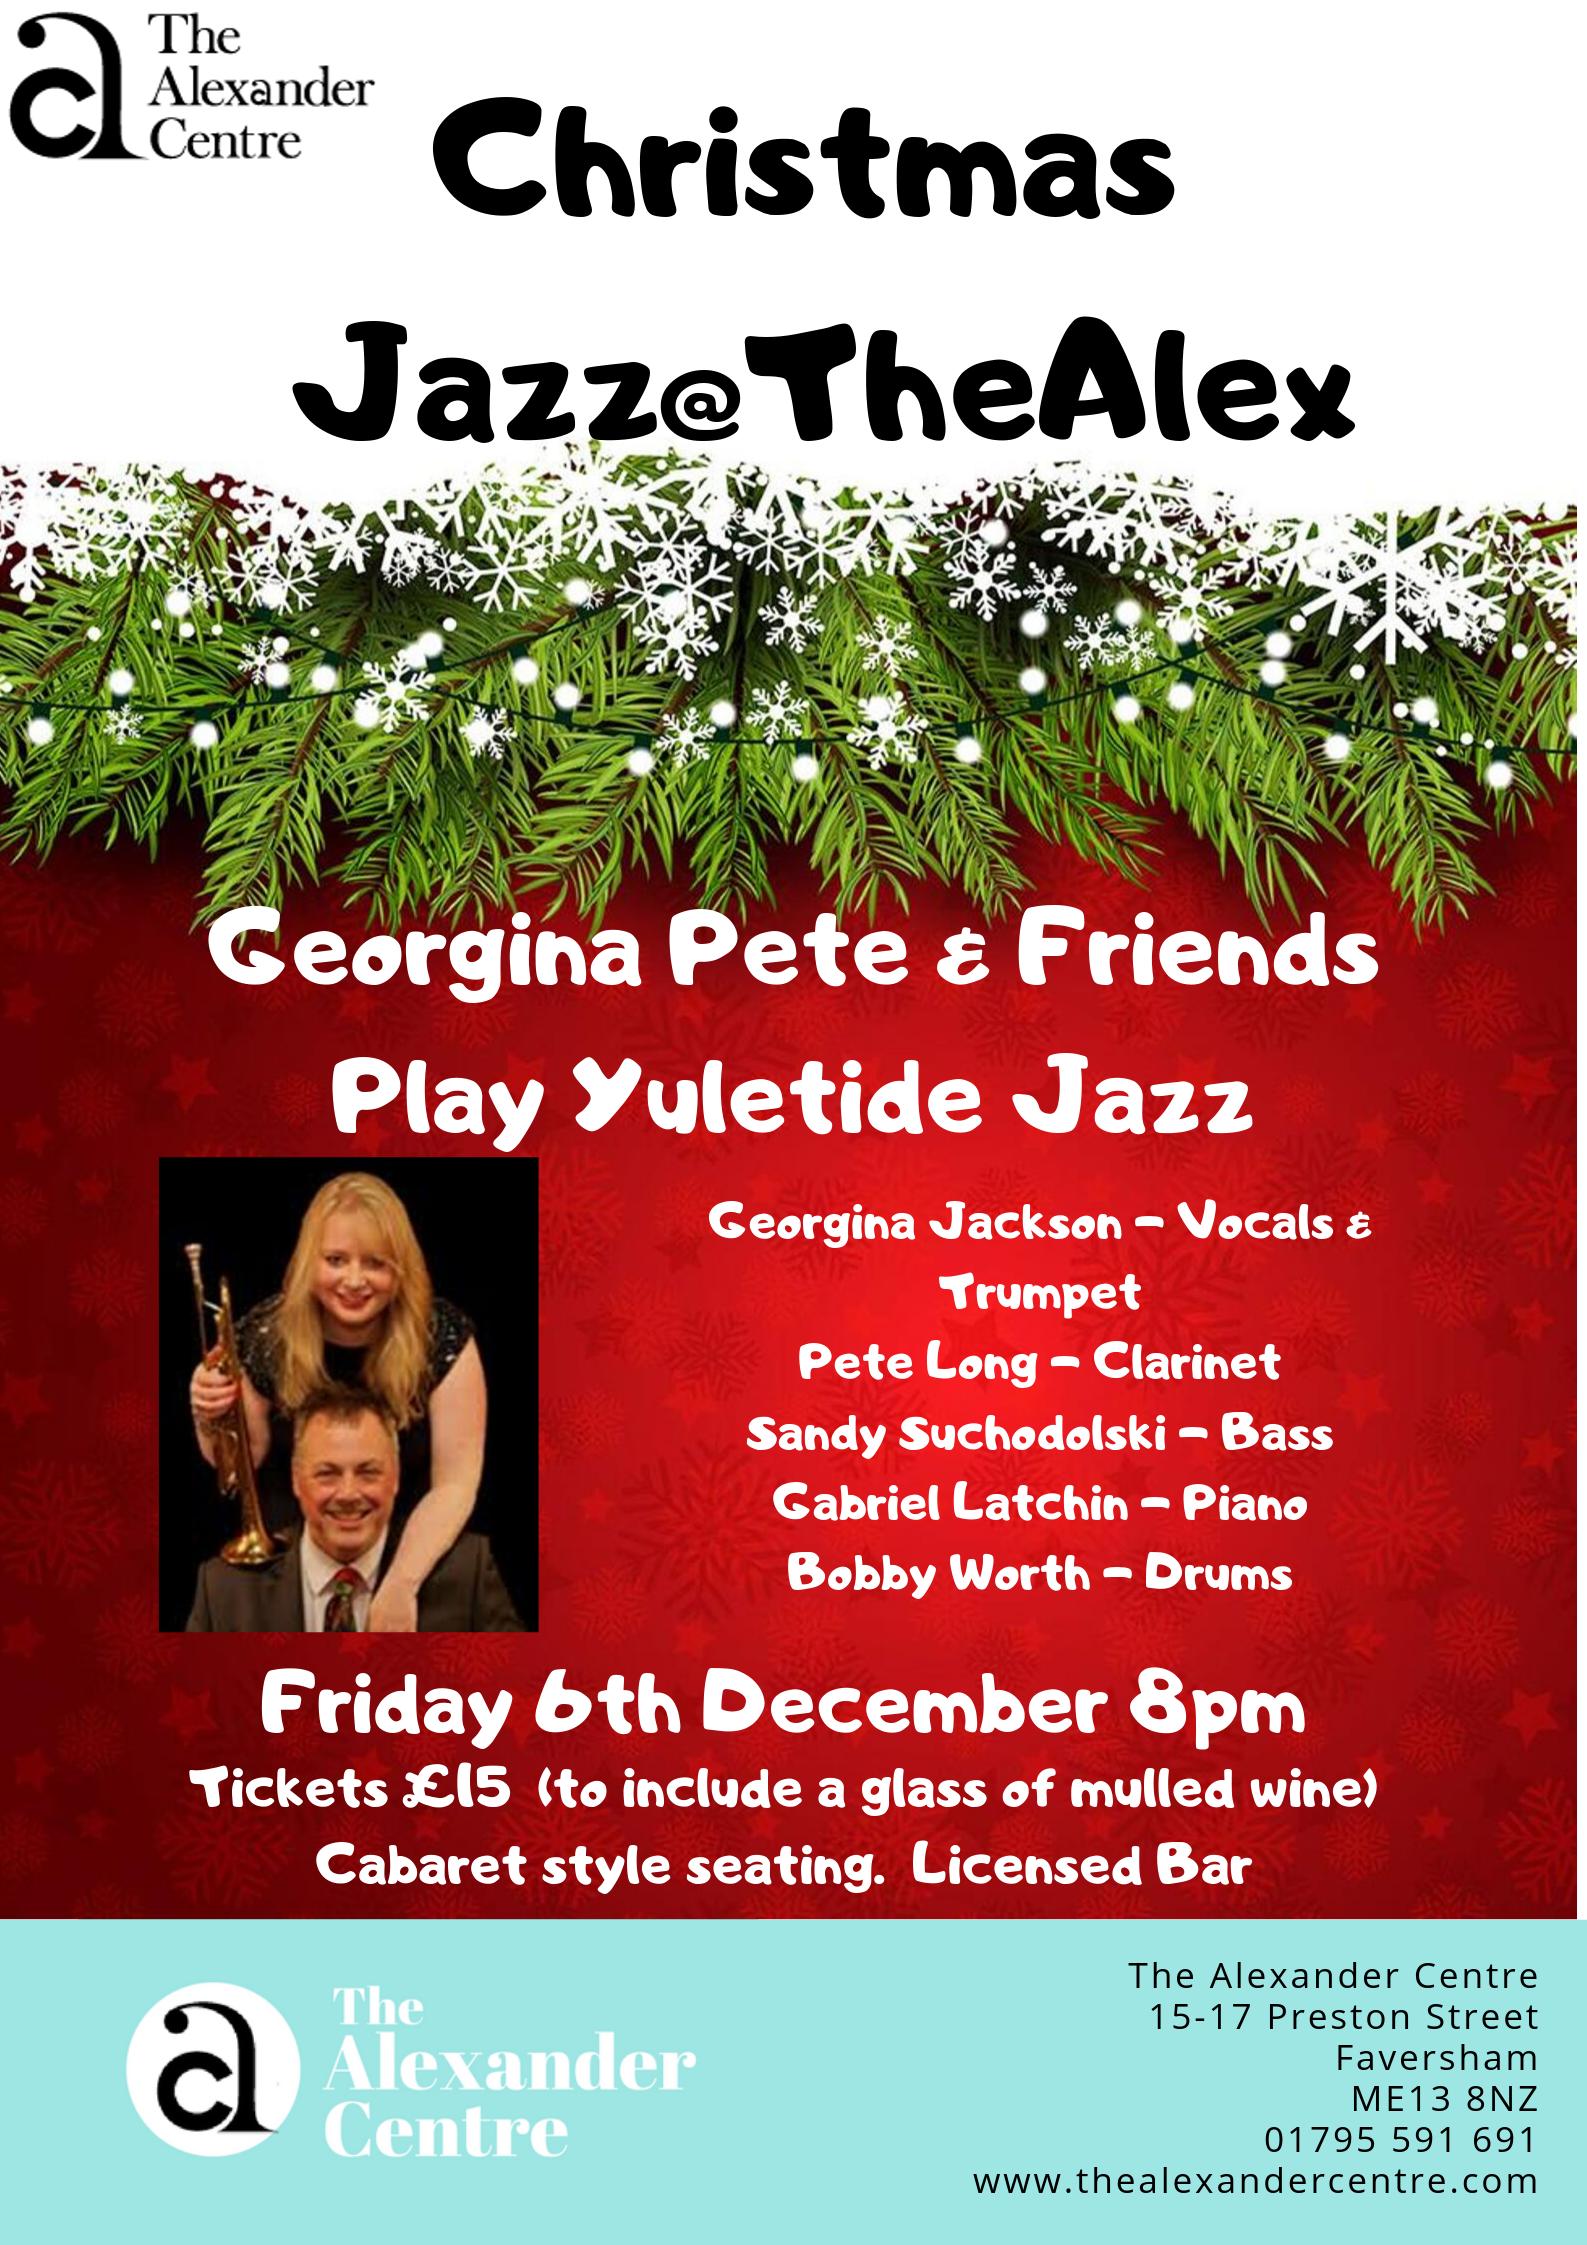 Christmas Jazz@TheAlex - Georgina, Pete & Friends play Yuletide Jazz